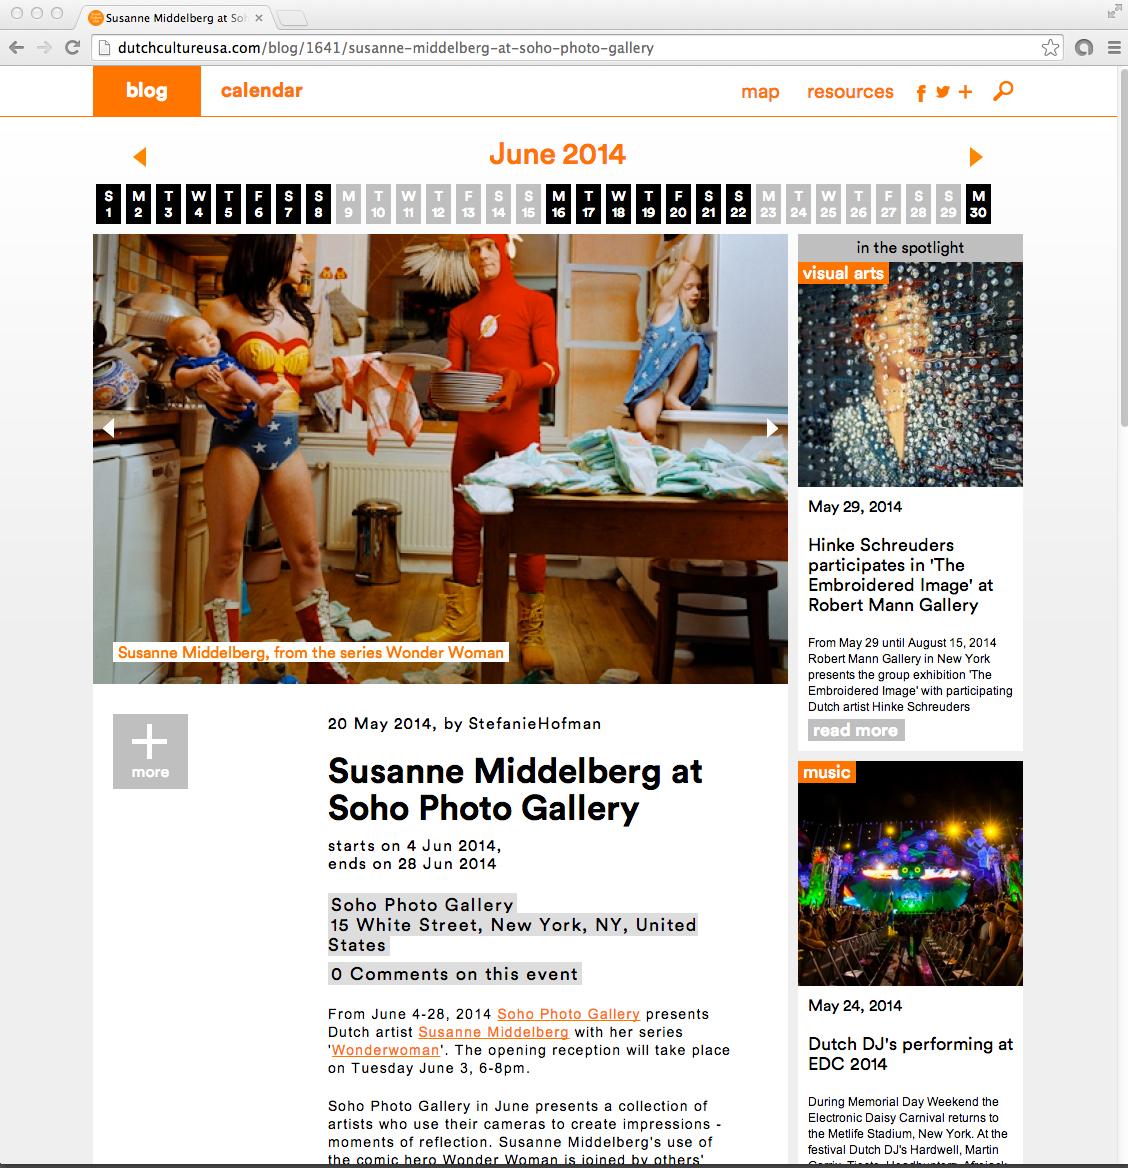 wonderwoman _Soho PhotoGallery New York_ Susanne Middelberg _Dennis van der Burch